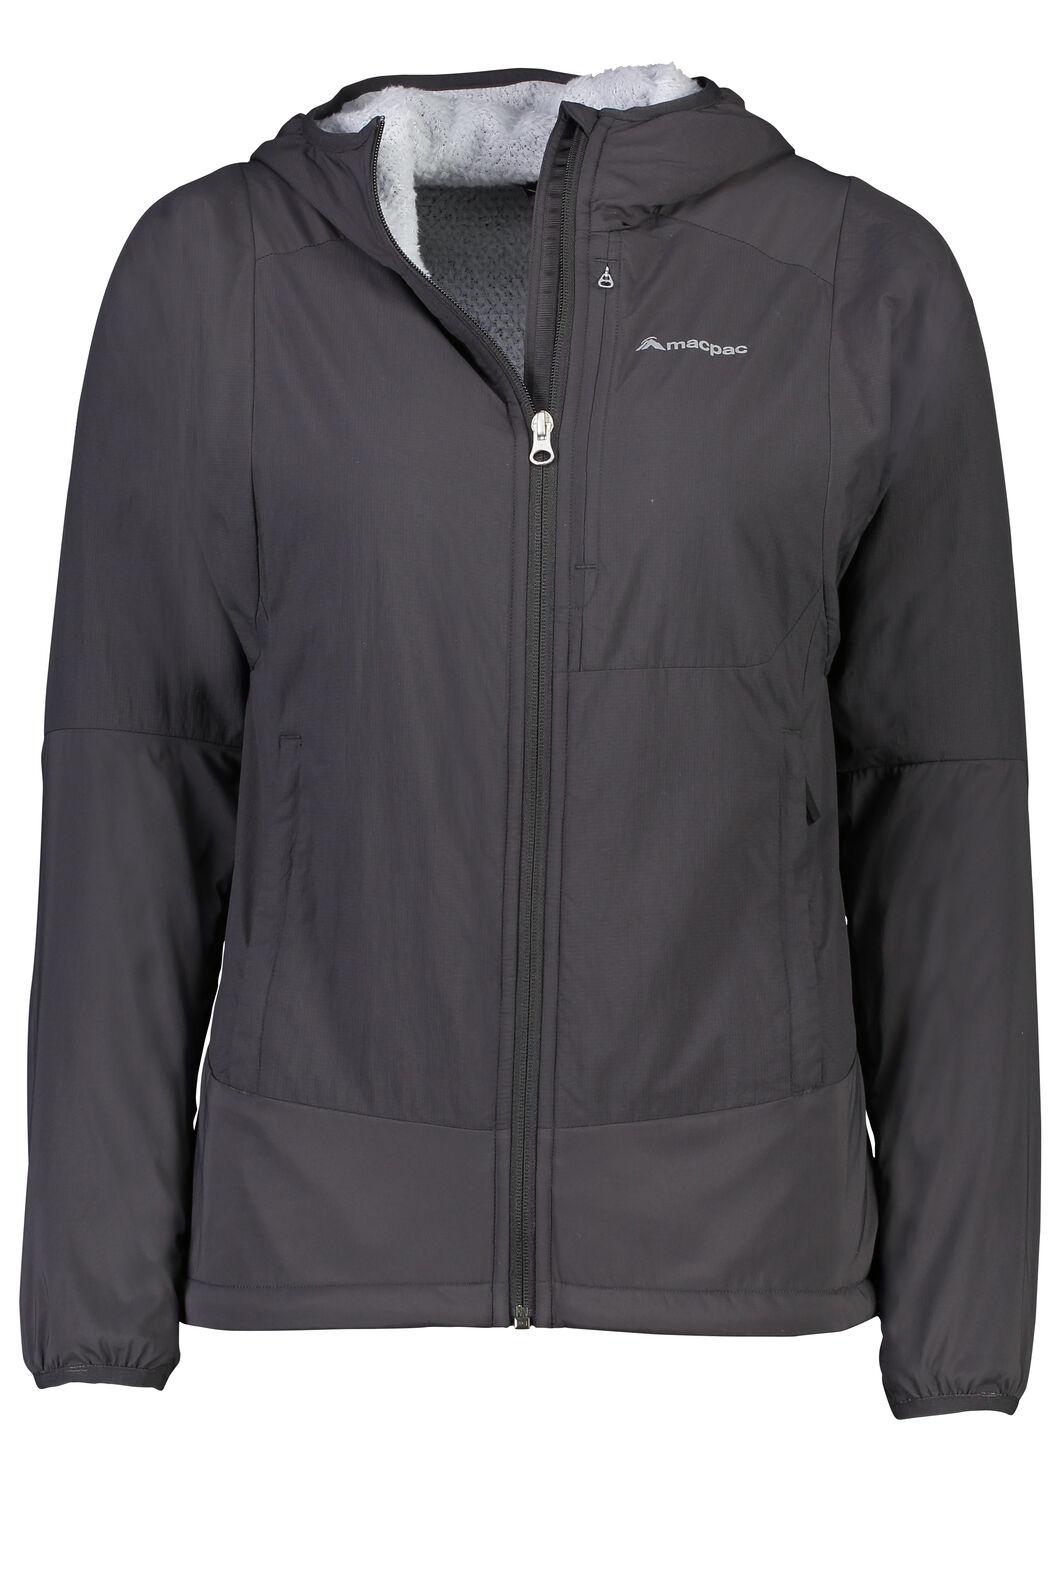 Macpac Pisa Polartec® Hooded Jacket - Women's, Phantom, hi-res